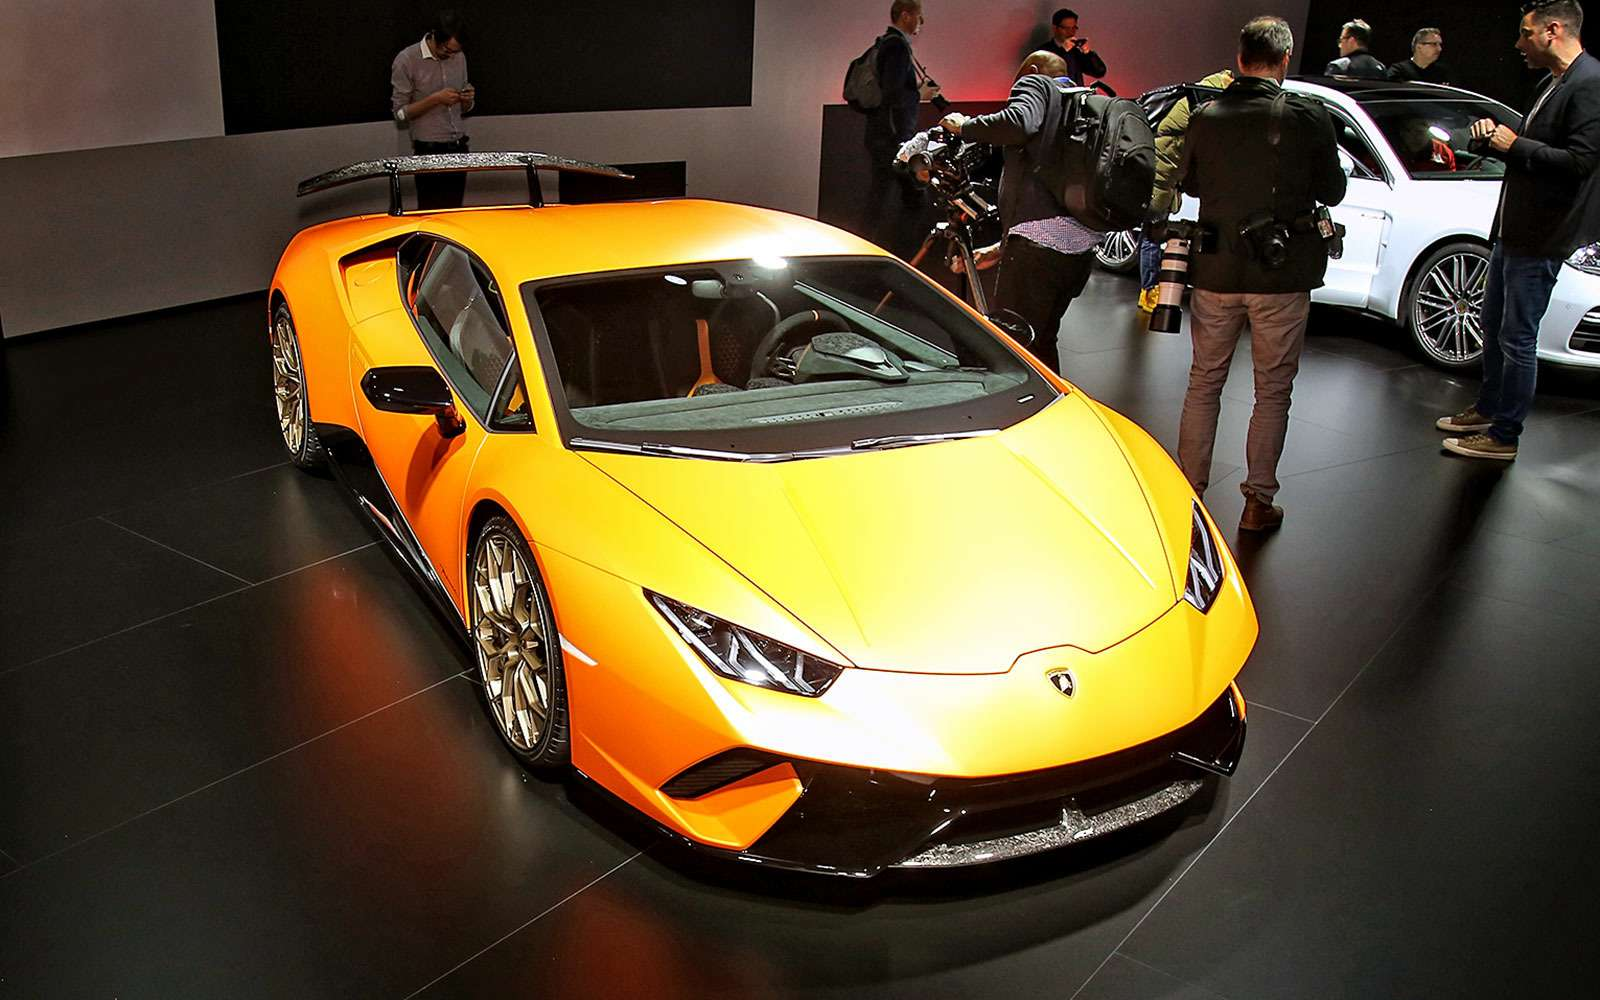 Тайны чемпиона: Lamborghini представила суперкар Huracan Performante— фото 717333